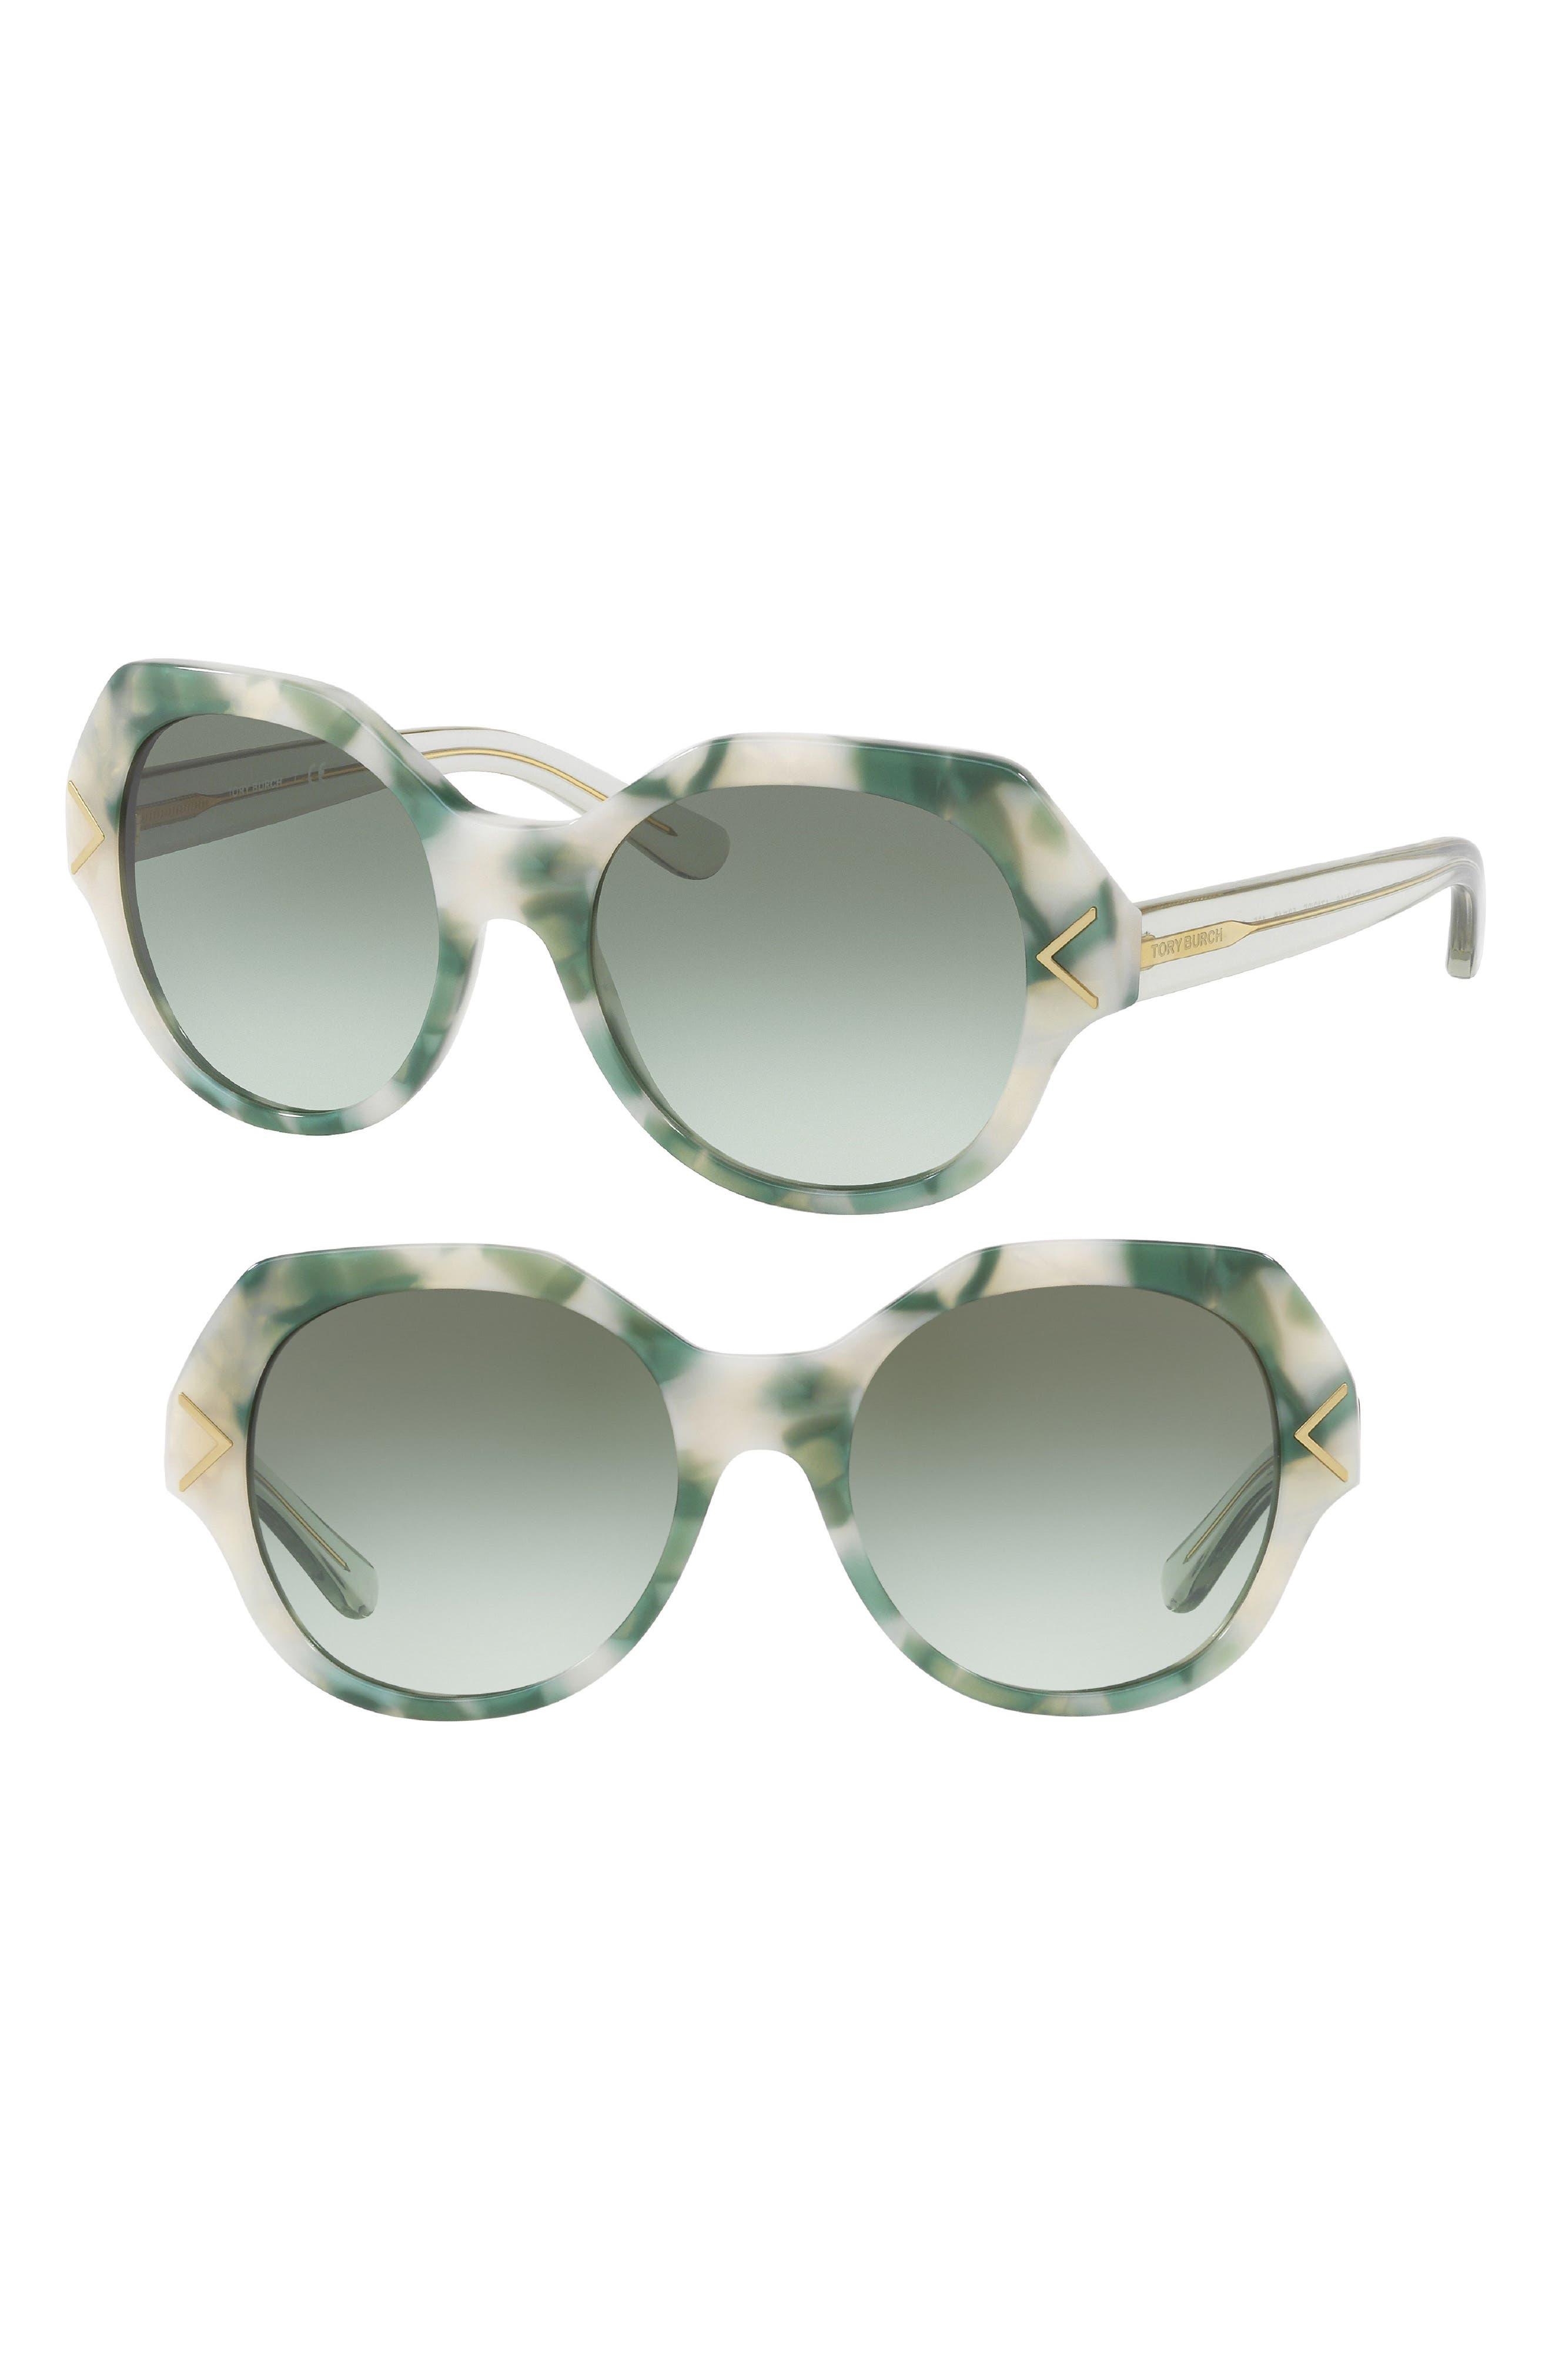 53mm Gradient Geometric Sunglasses,                         Main,                         color, Dark Green Marble